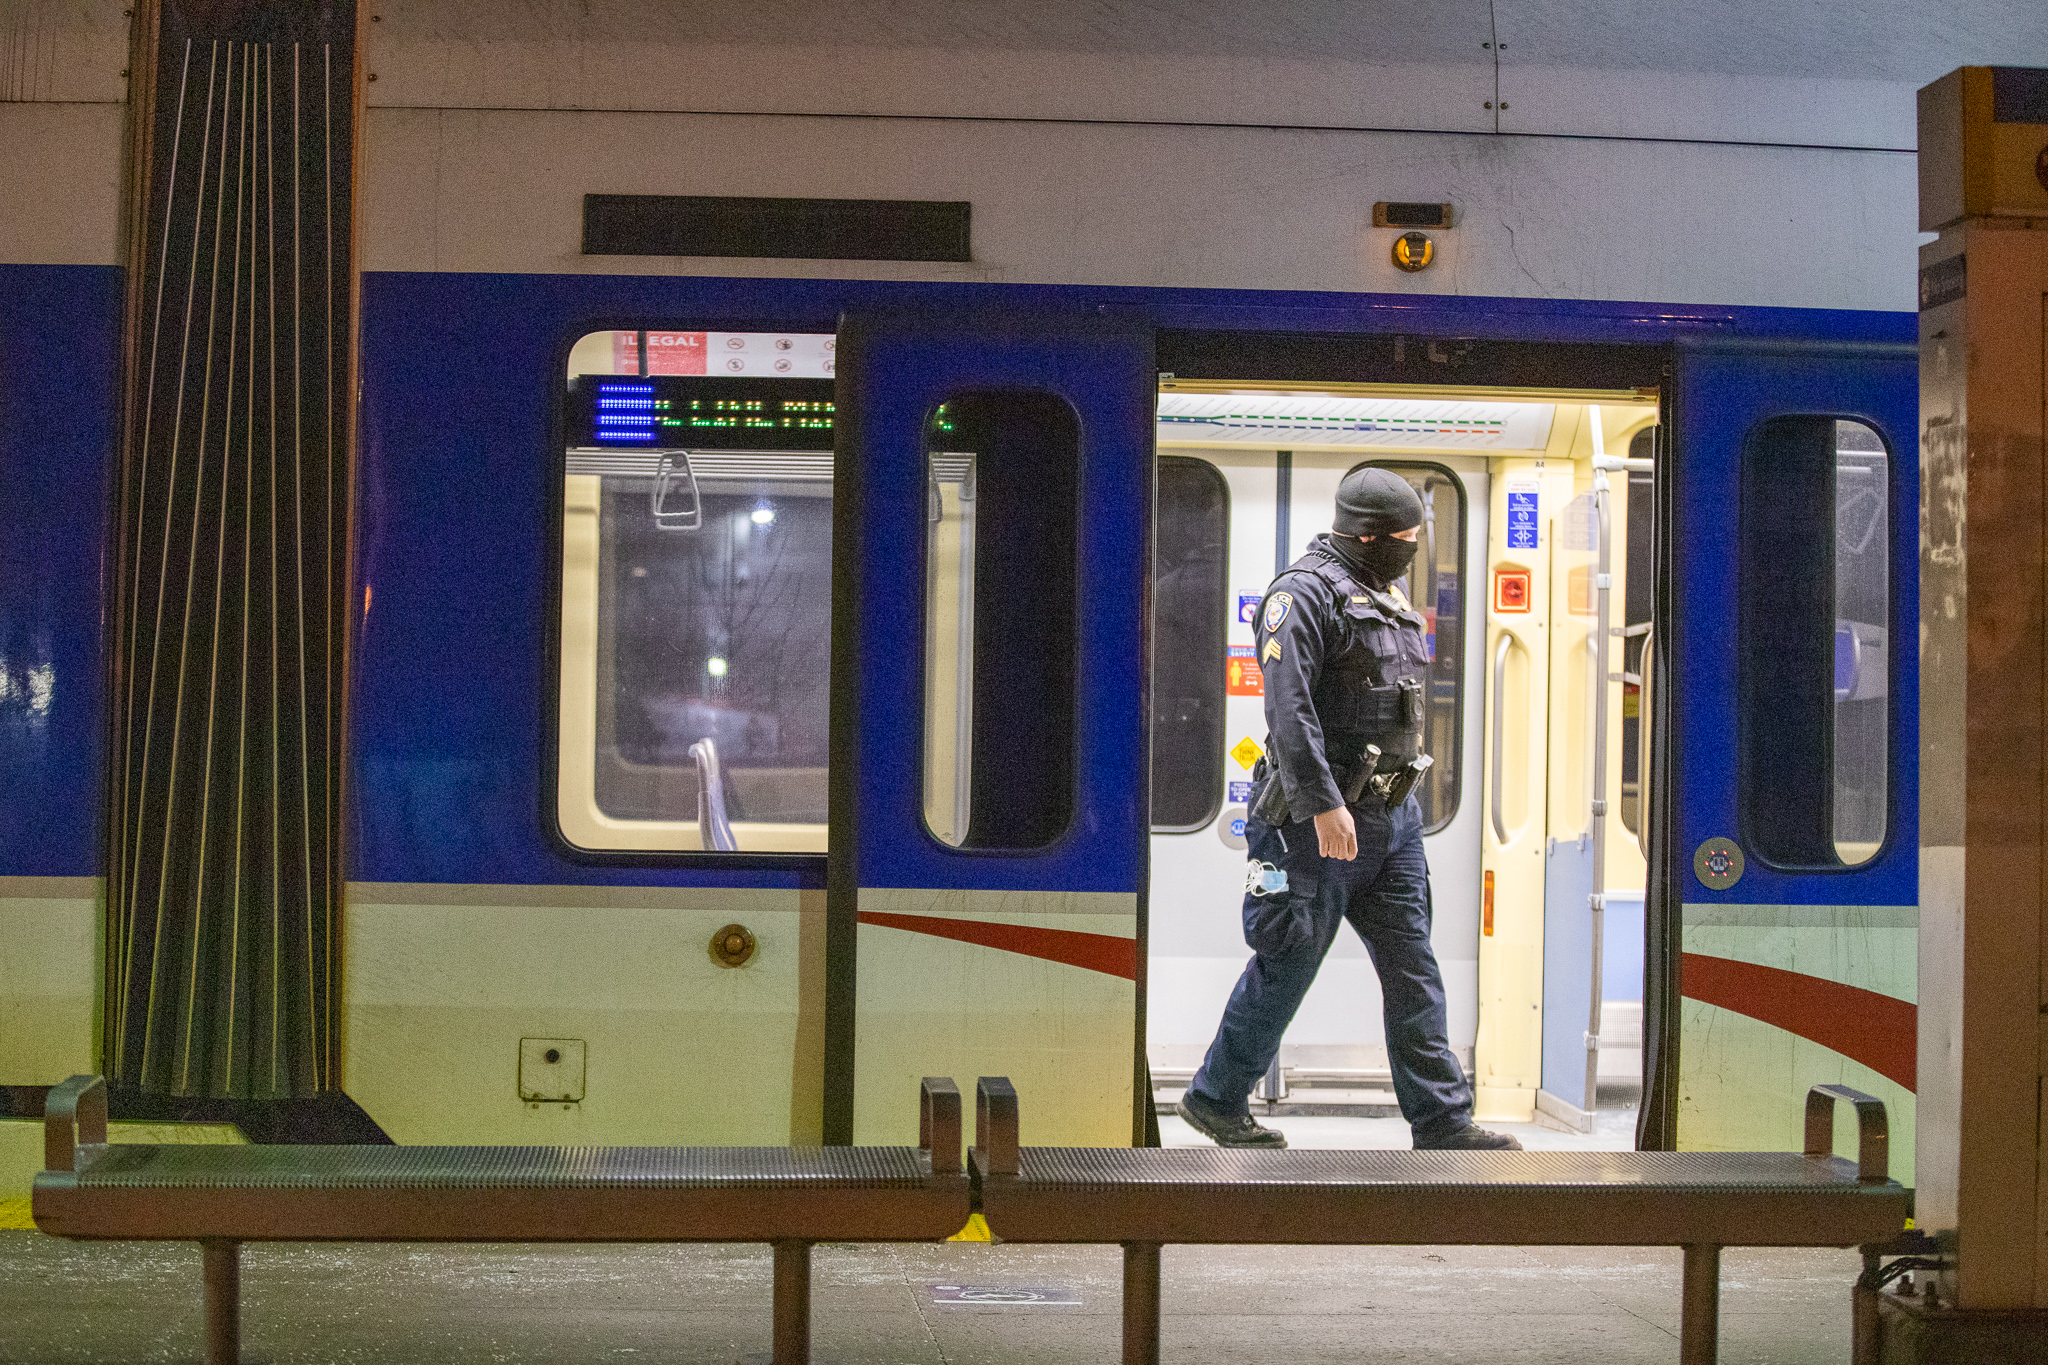 Legislature debating decriminalizing fare evasion, allowing Metro Transit to focus on more serious crimes